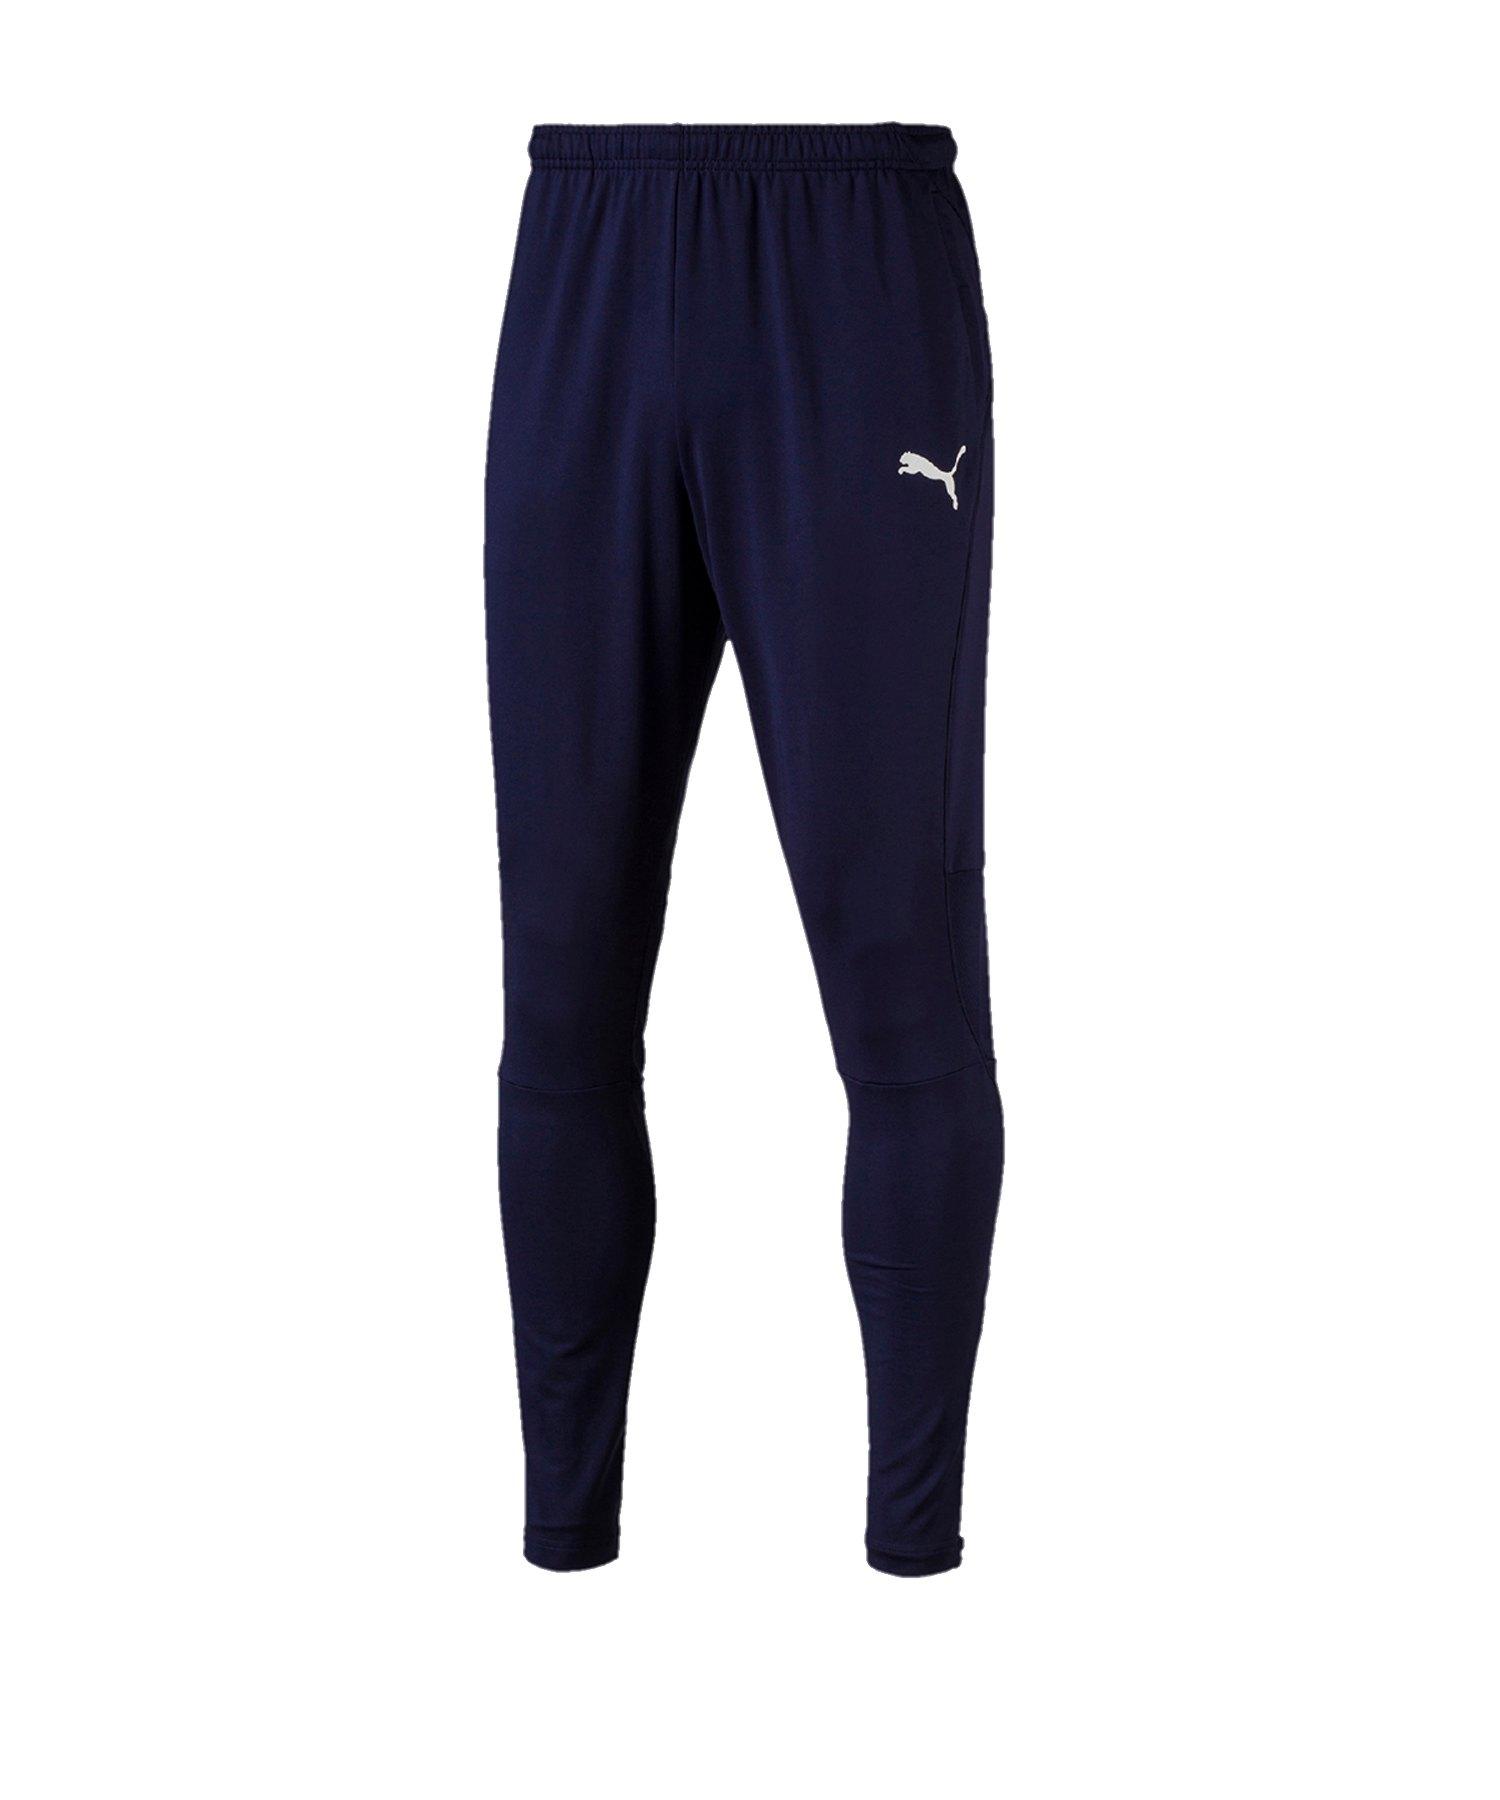 PUMA LIGA Training Pant Jogginghose Blau F06 - blau